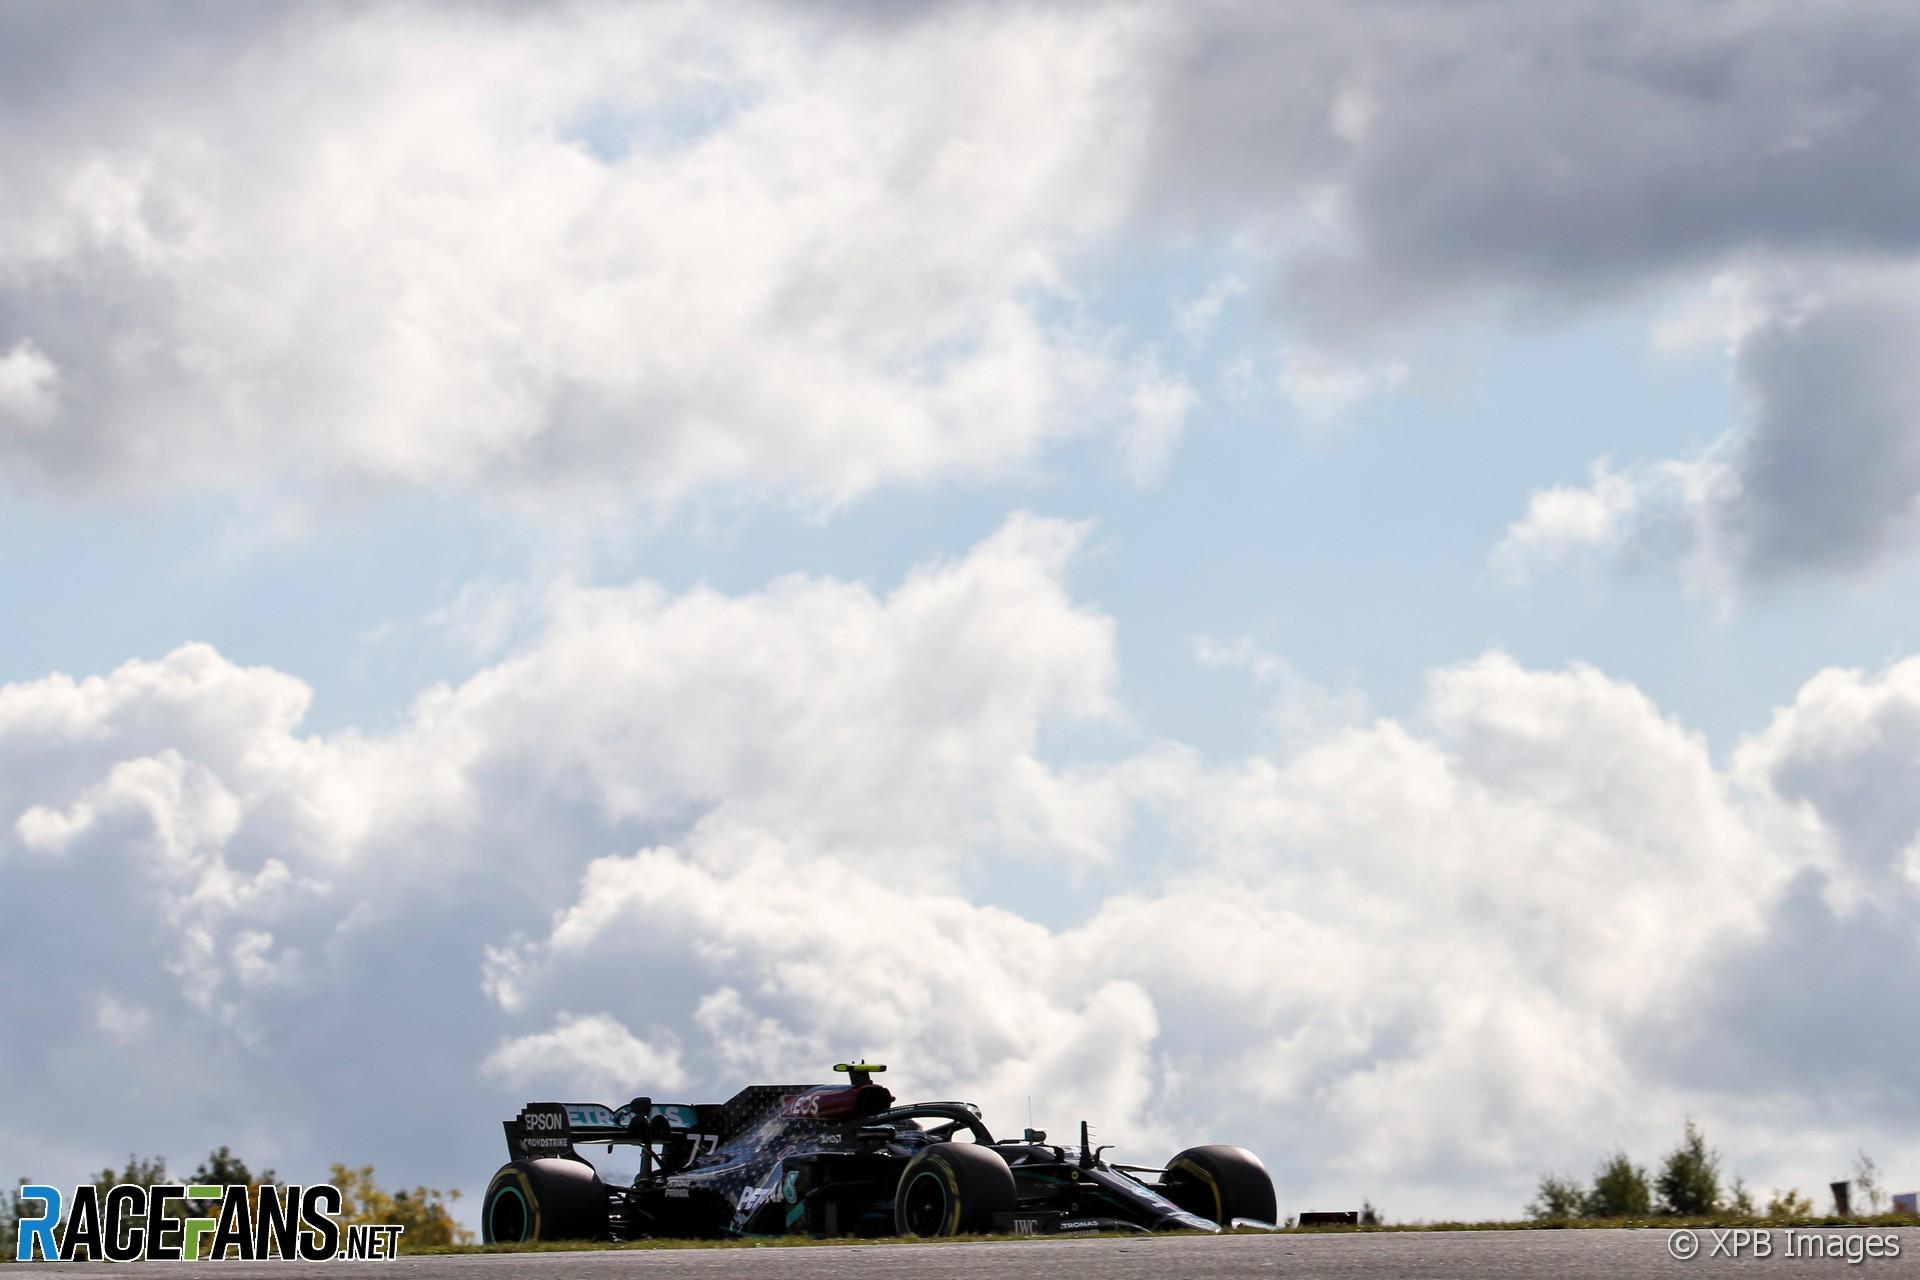 Valtteri Bottas, Mercedes, Nurburgring, 2020